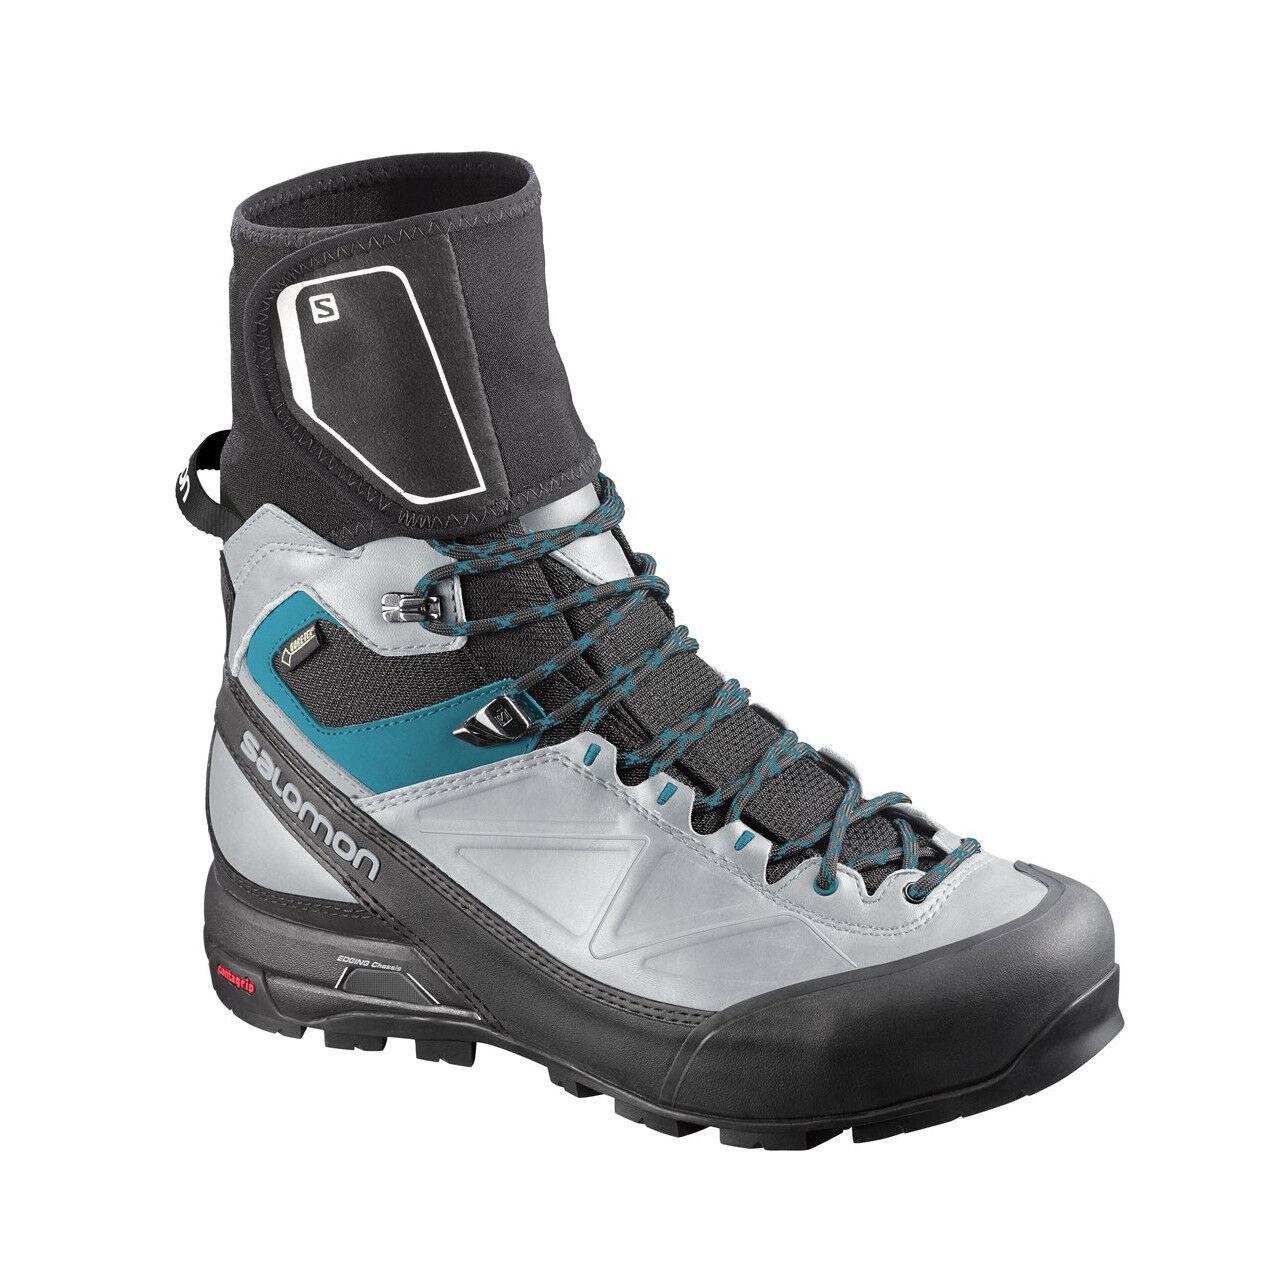 Salomon X Alp Pro GTX W Womens shoes Outdoor Boots Gore Tex Hiking shoes